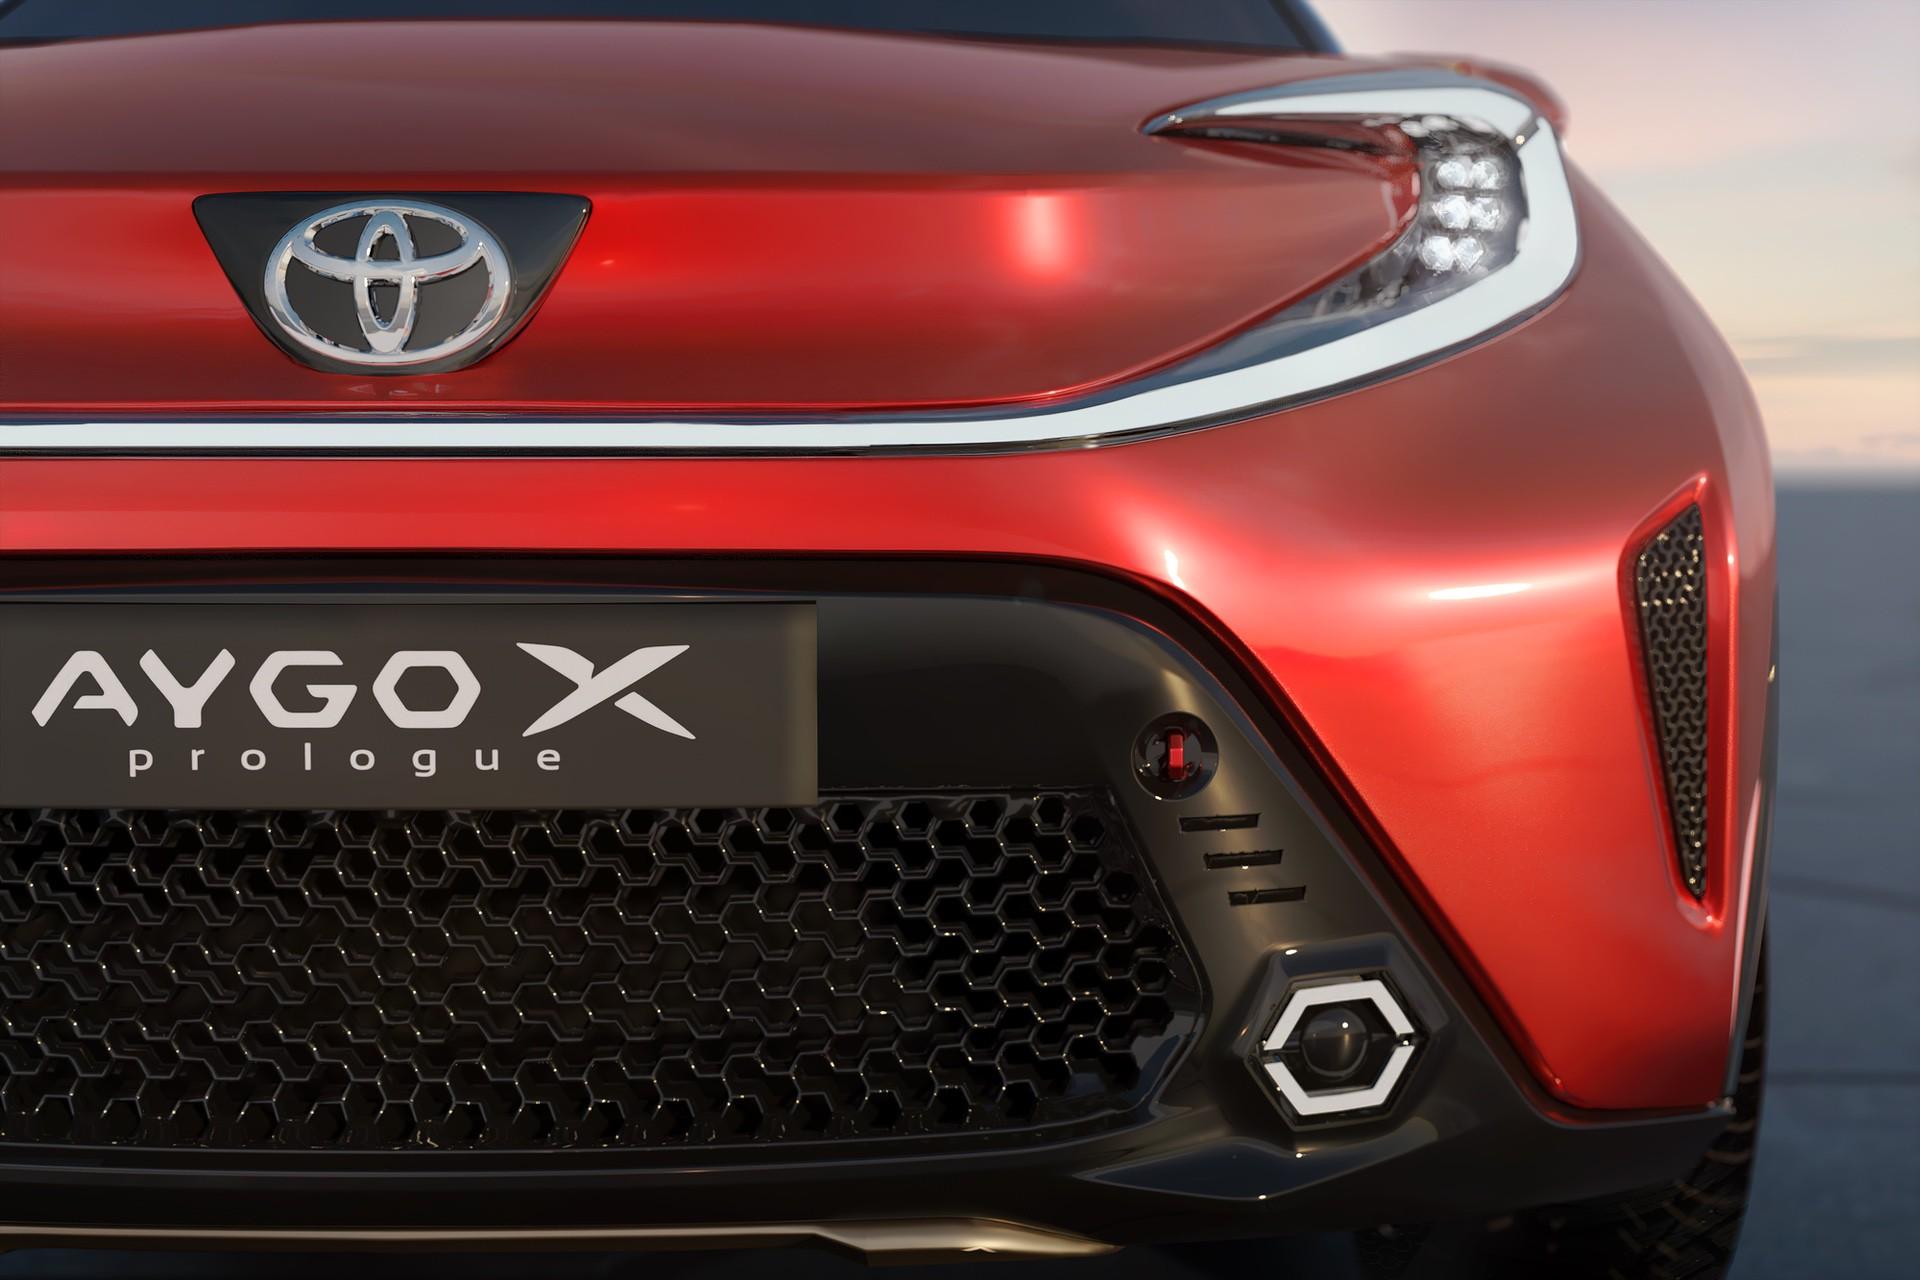 Toyota_Aygo_X_prologue-0018